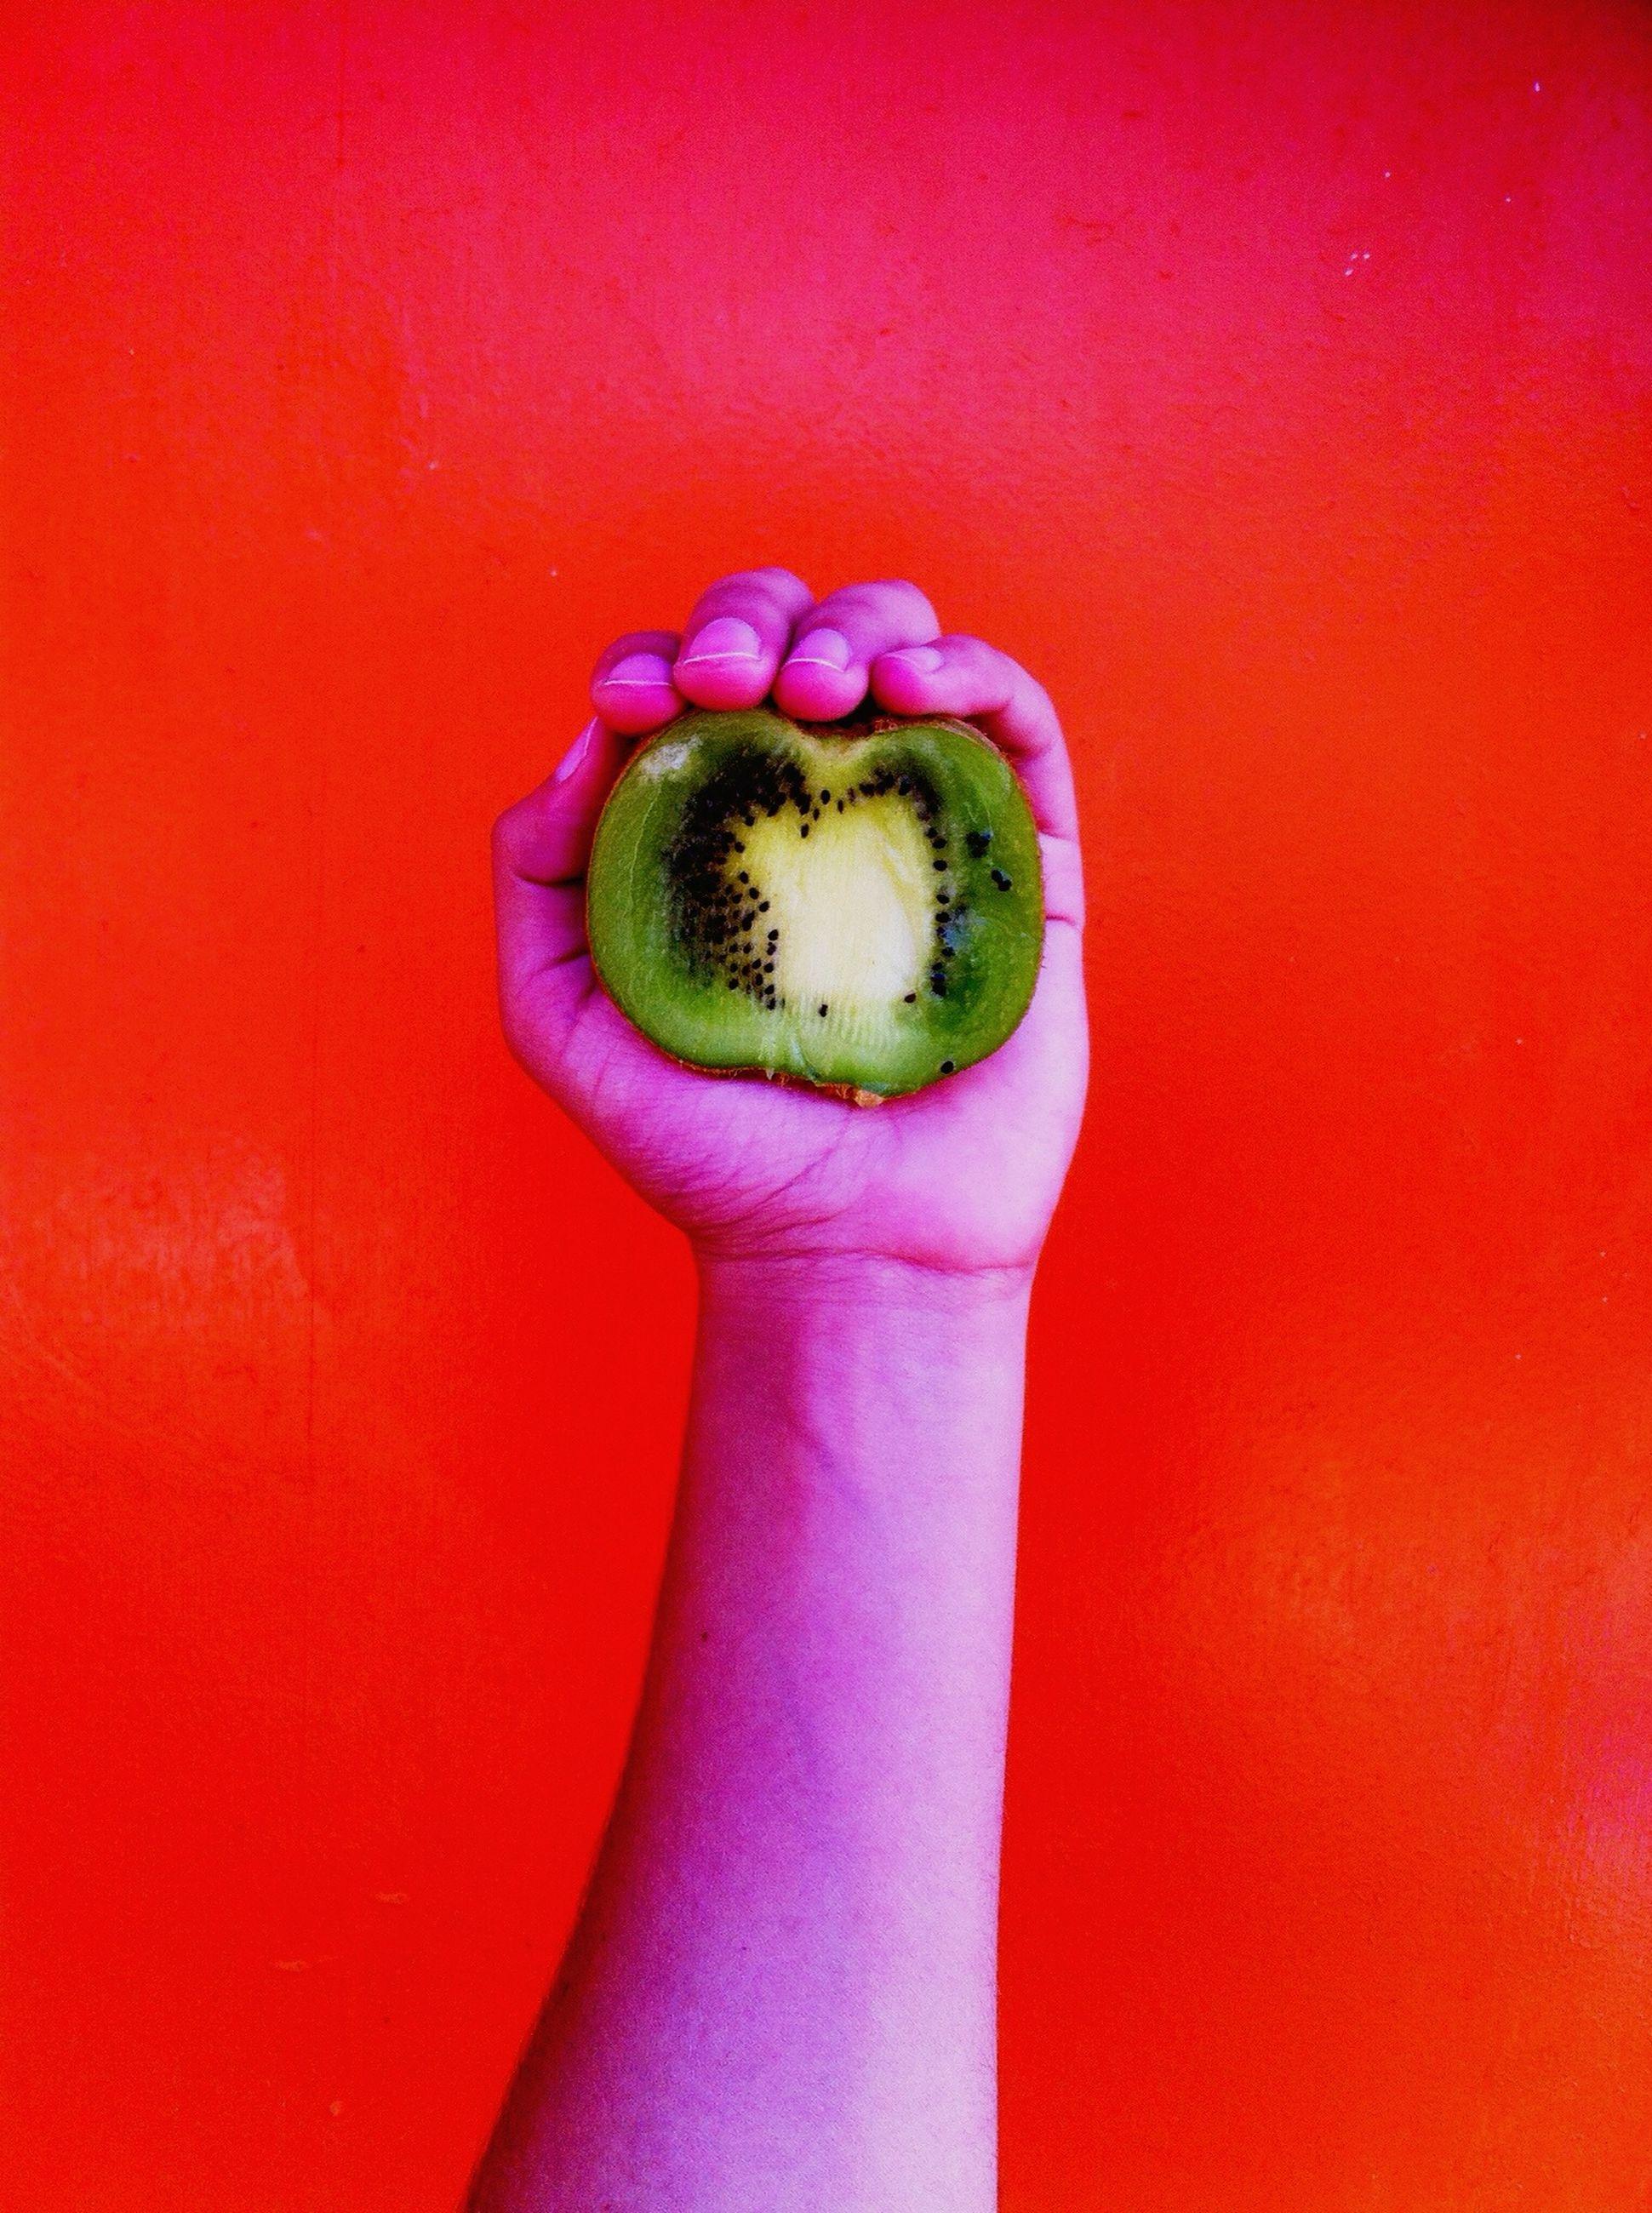 food and drink, freshness, food, indoors, red, close-up, healthy eating, still life, slice, studio shot, vegetable, sweet food, fruit, indulgence, vibrant color, organic, orange color, no people, white color